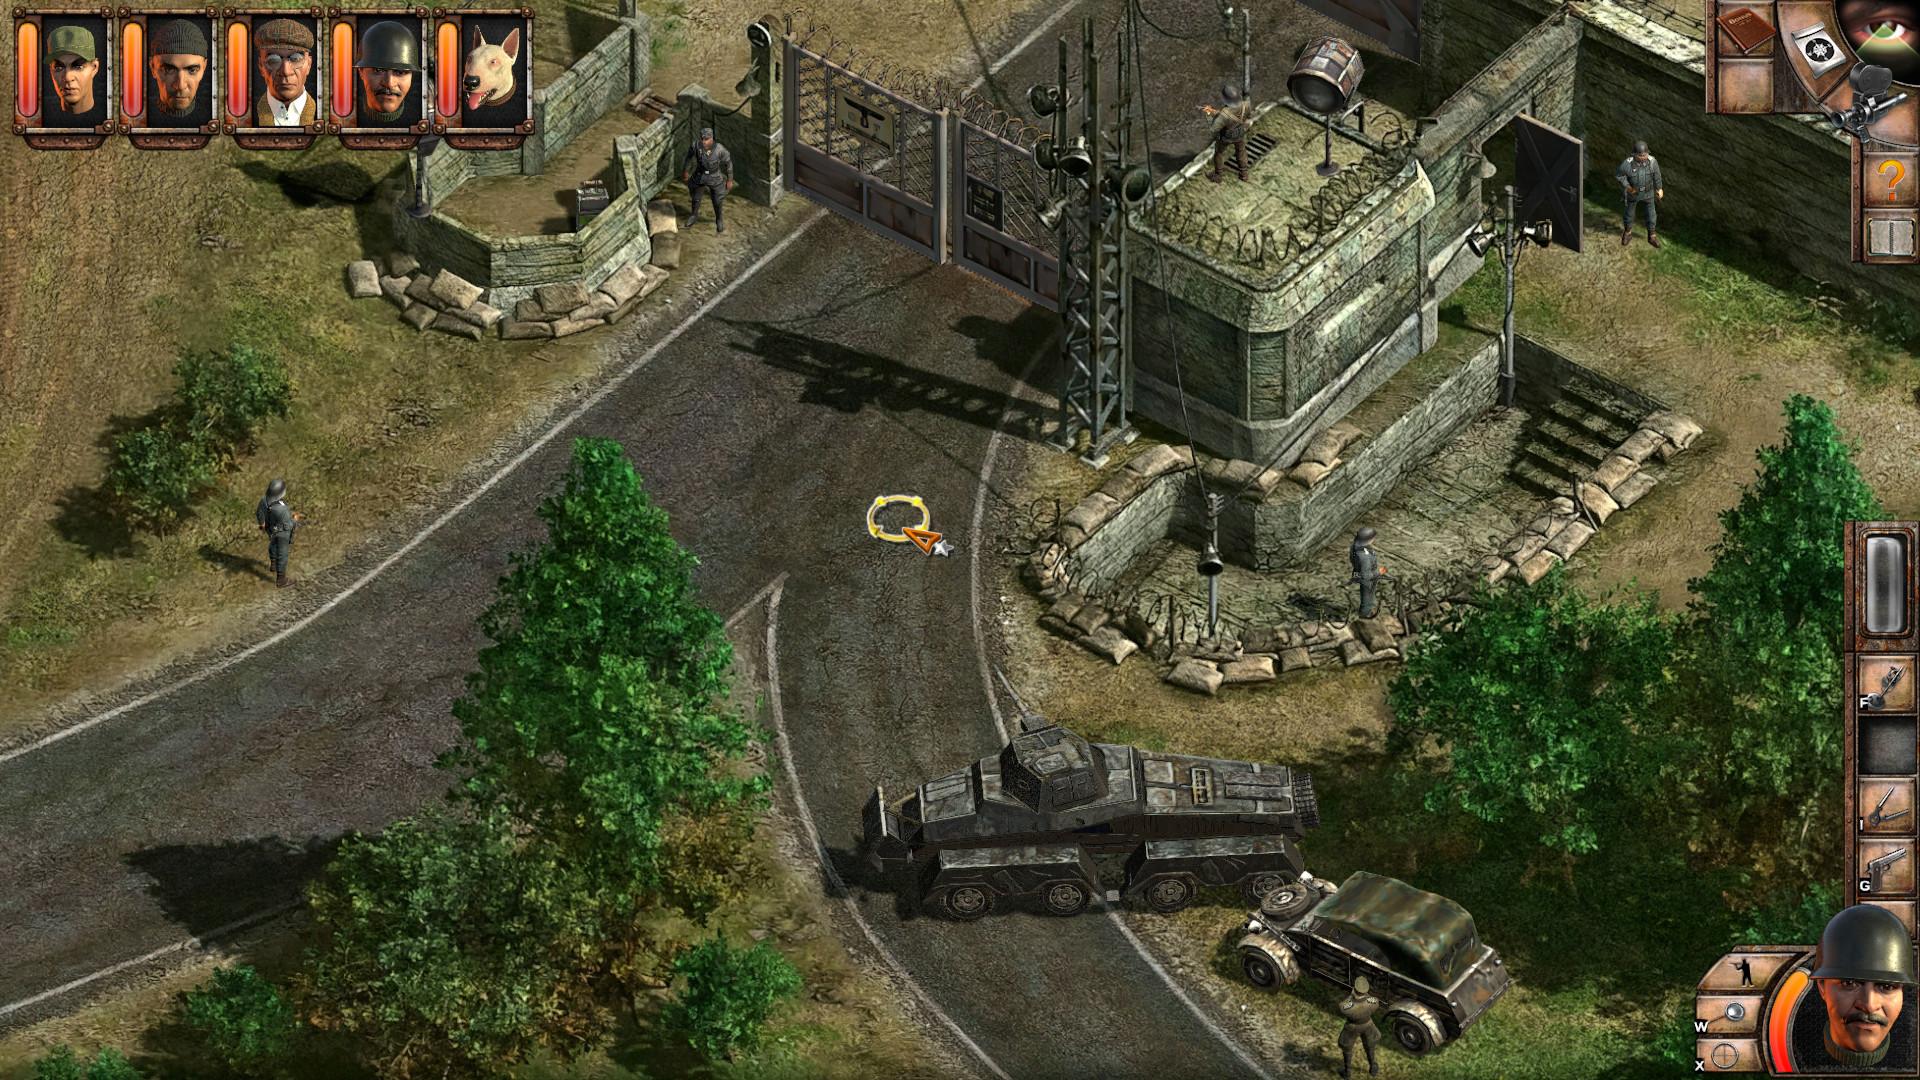 Games commandos 2 download cherokee casino roland oklahoma buffet